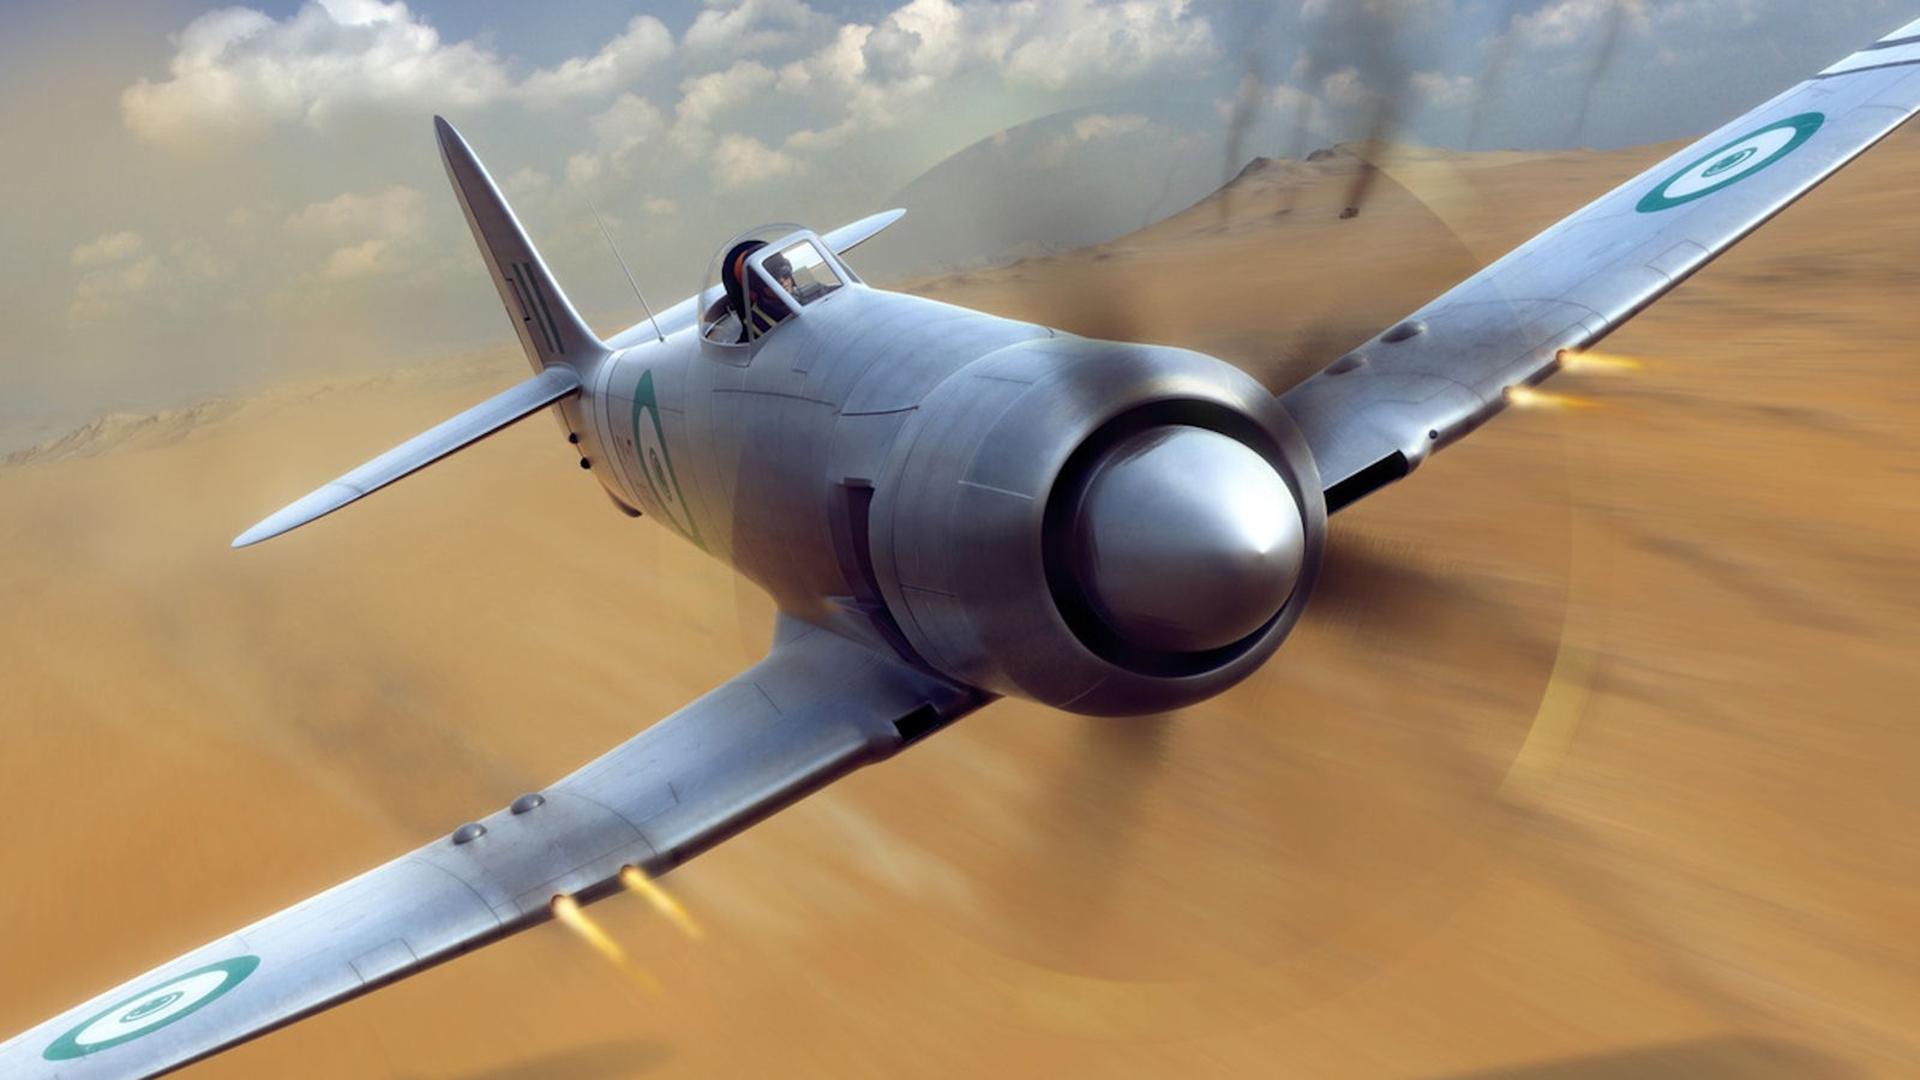 1 Hawker Sea Fury Hd Wallpapers  Backgrounds Wallpaper